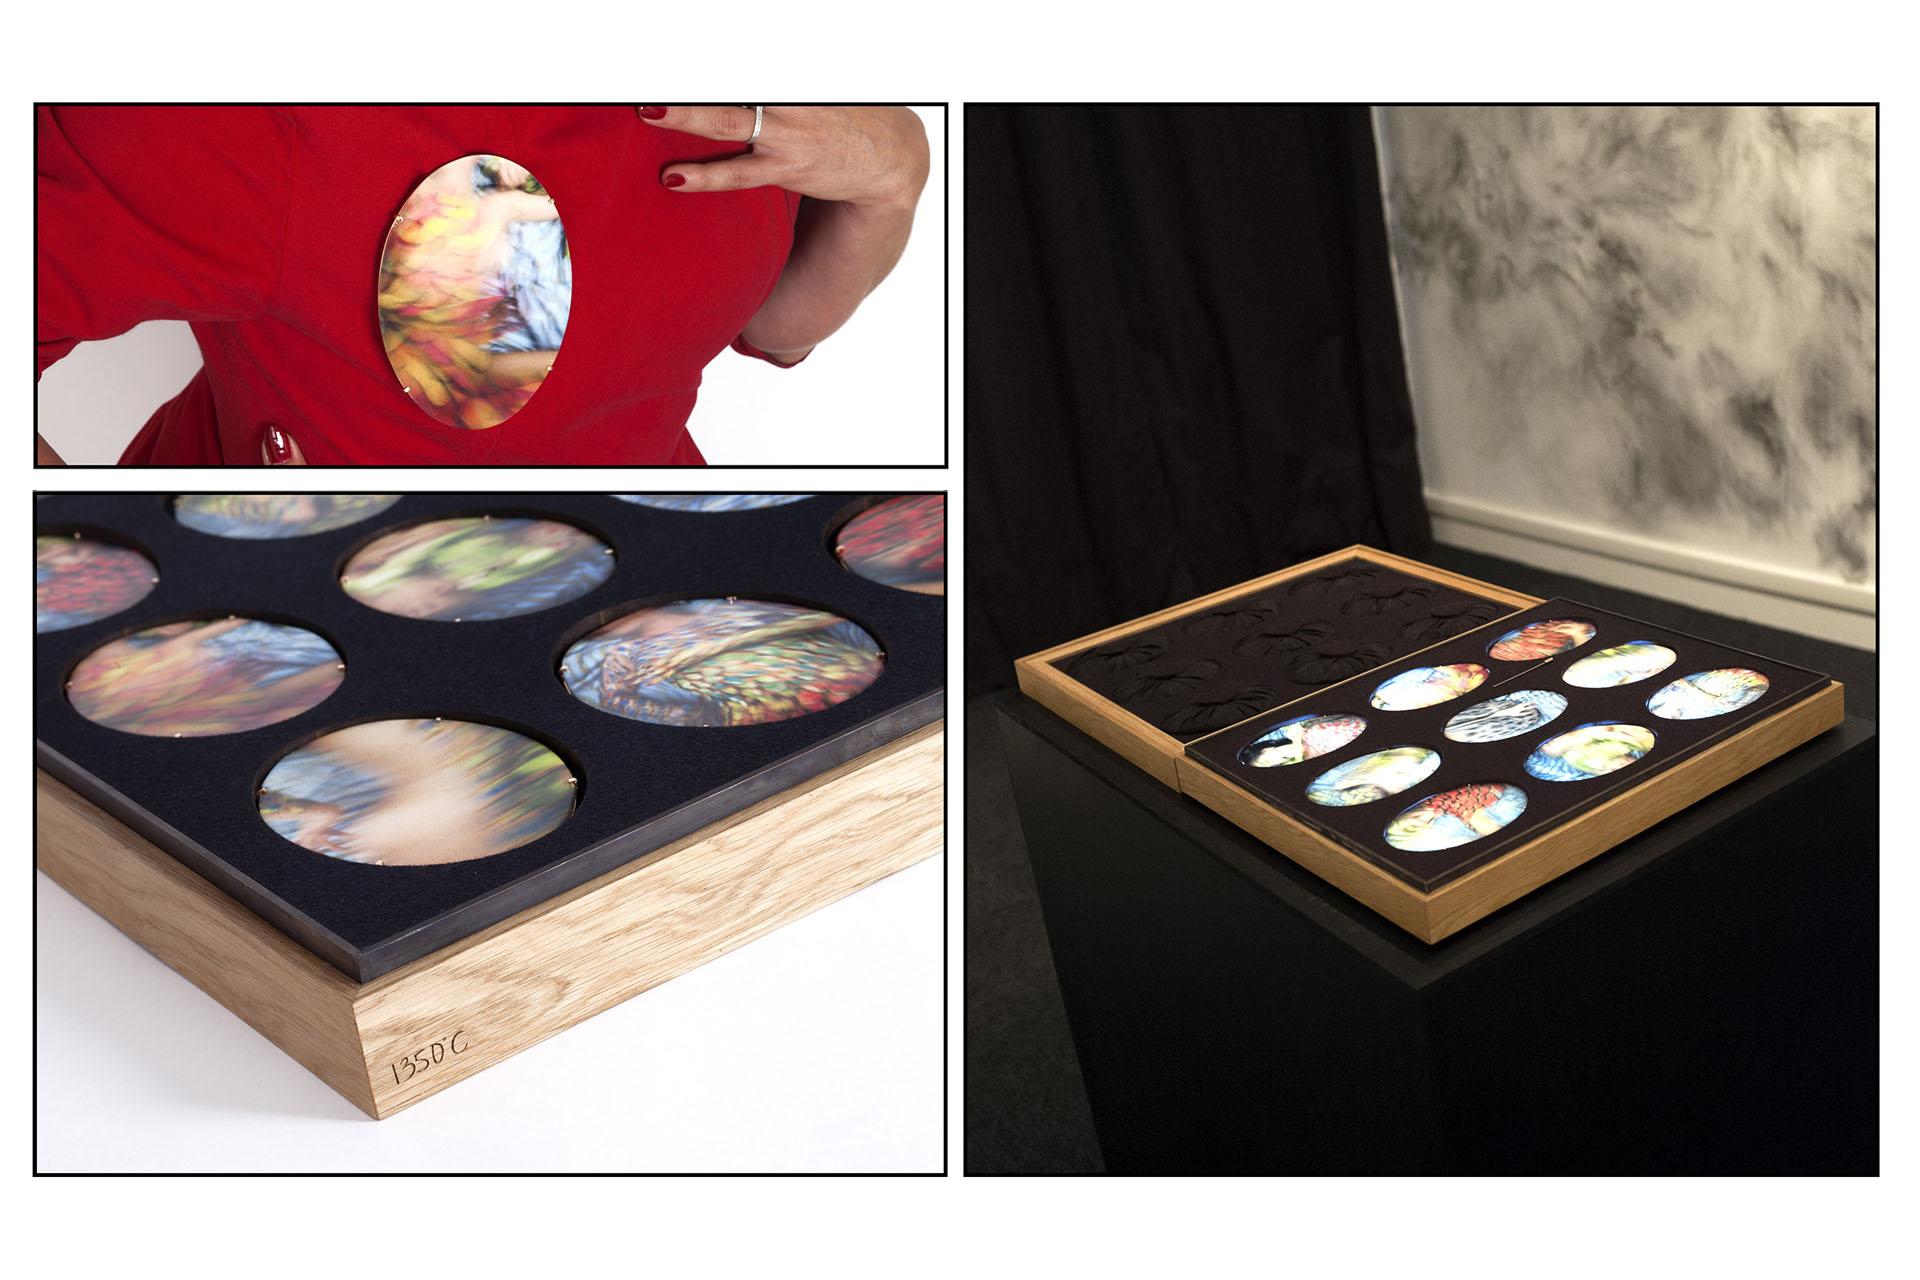 3 - 1350°C - Objet & bijoux